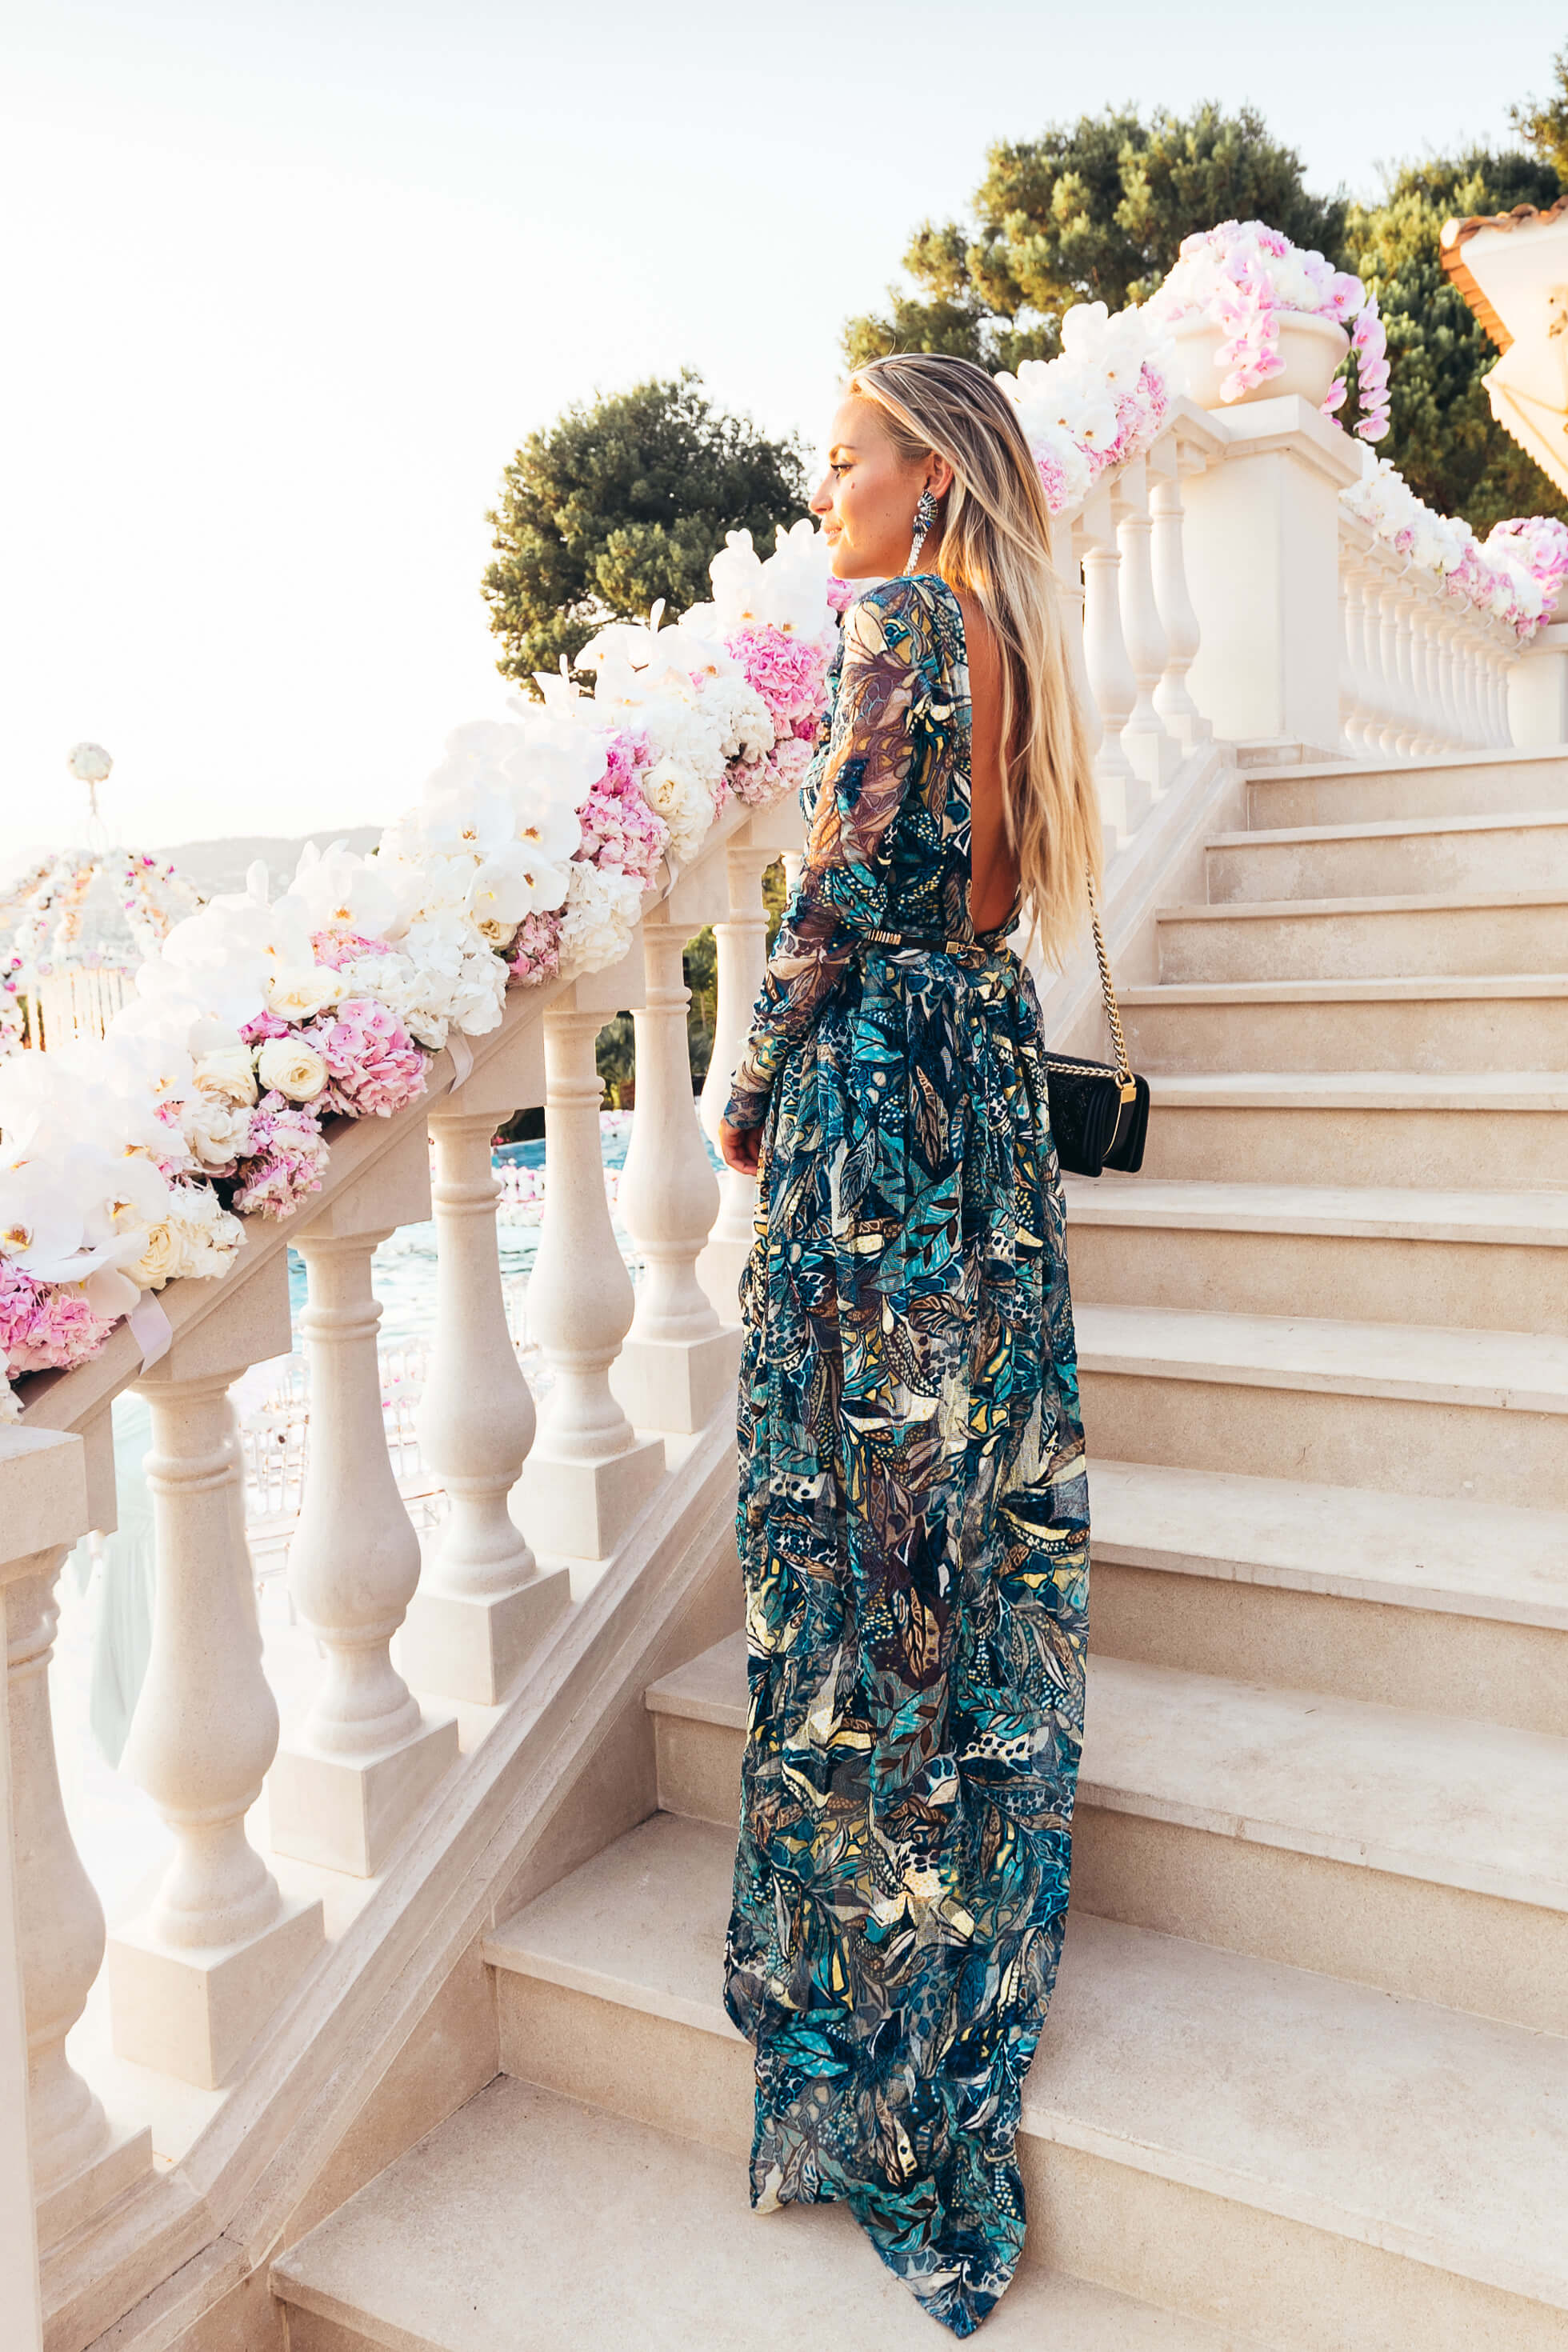 janni-deler-wedding-lookJ1130317-Redigera